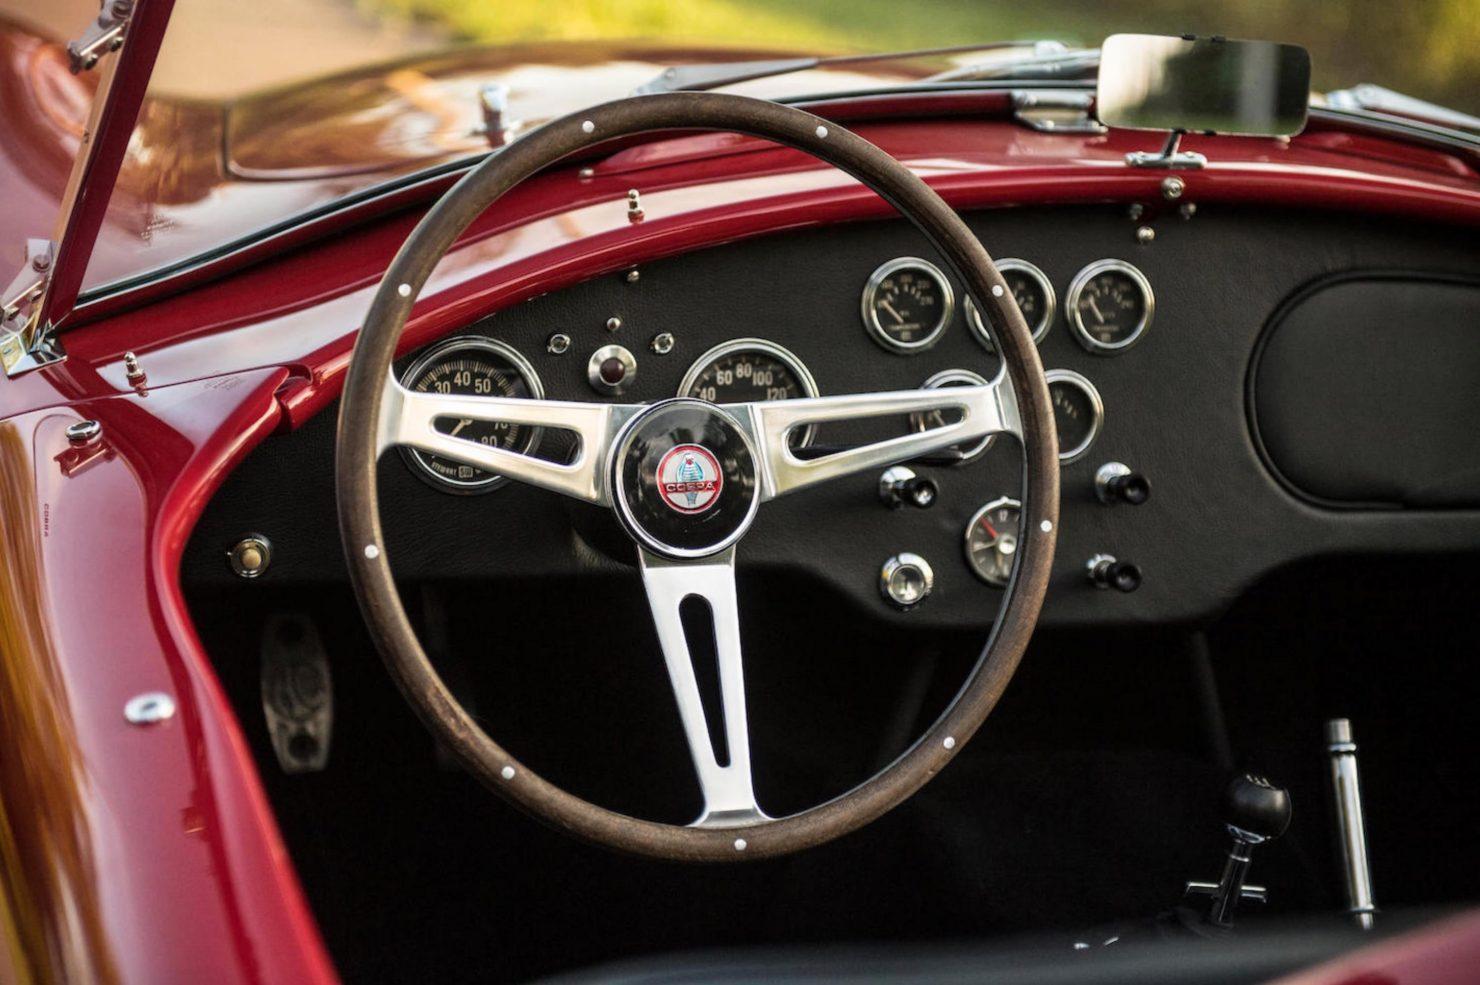 shelby ac cobra 289 17 1480x985 - 1964 Shelby AC Cobra 289